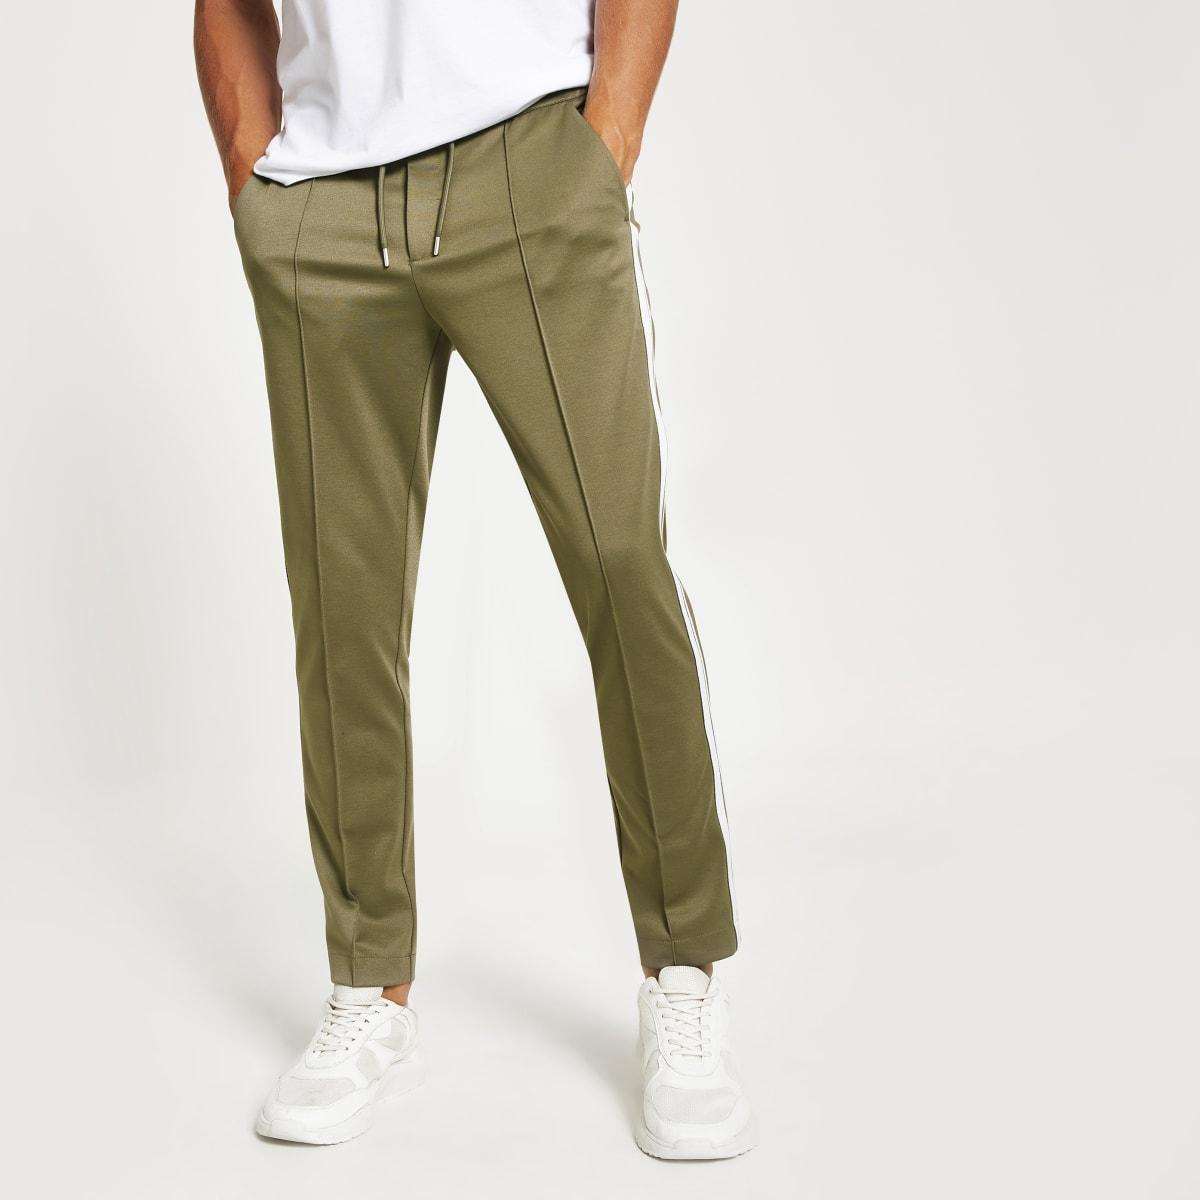 Eng zulaufende Skinny Fit Jogginghosen in Khaki